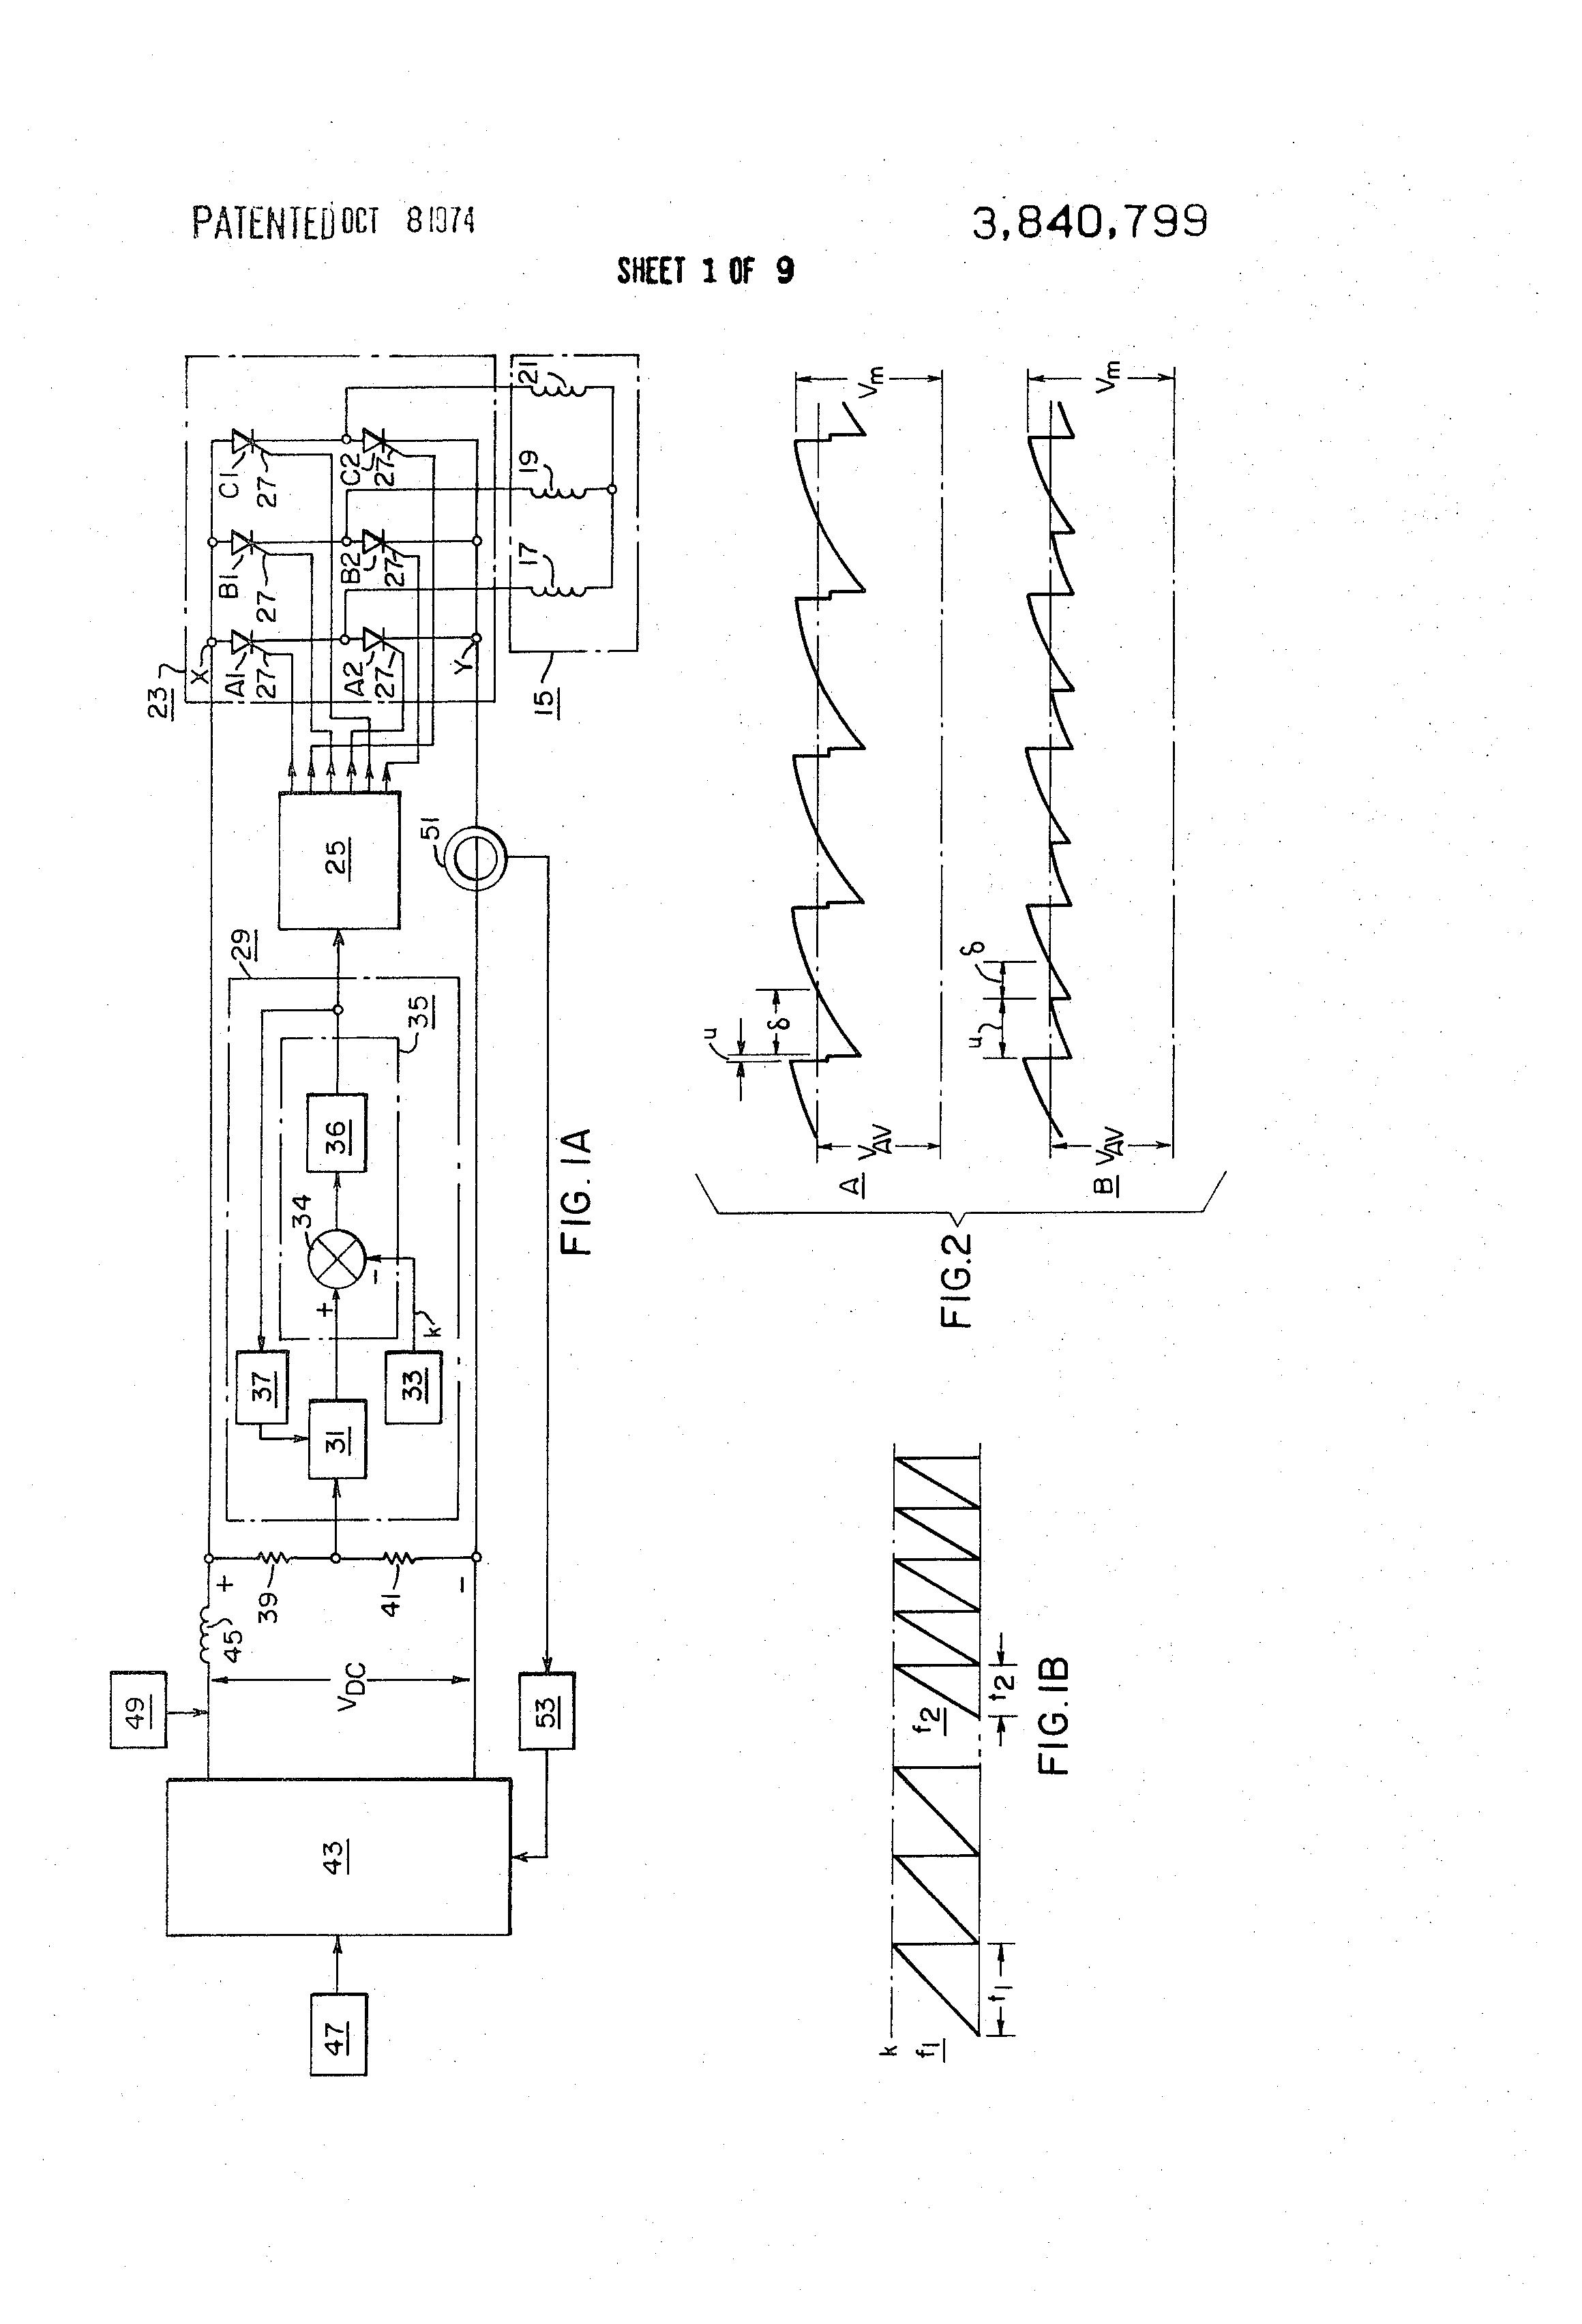 snyder general wiring diagram 3 international 9400i mi engine Johnson Controls Wiring Diagram  Elec Wiring-Diagram Basic Wiring Diagram Ladder Diagram